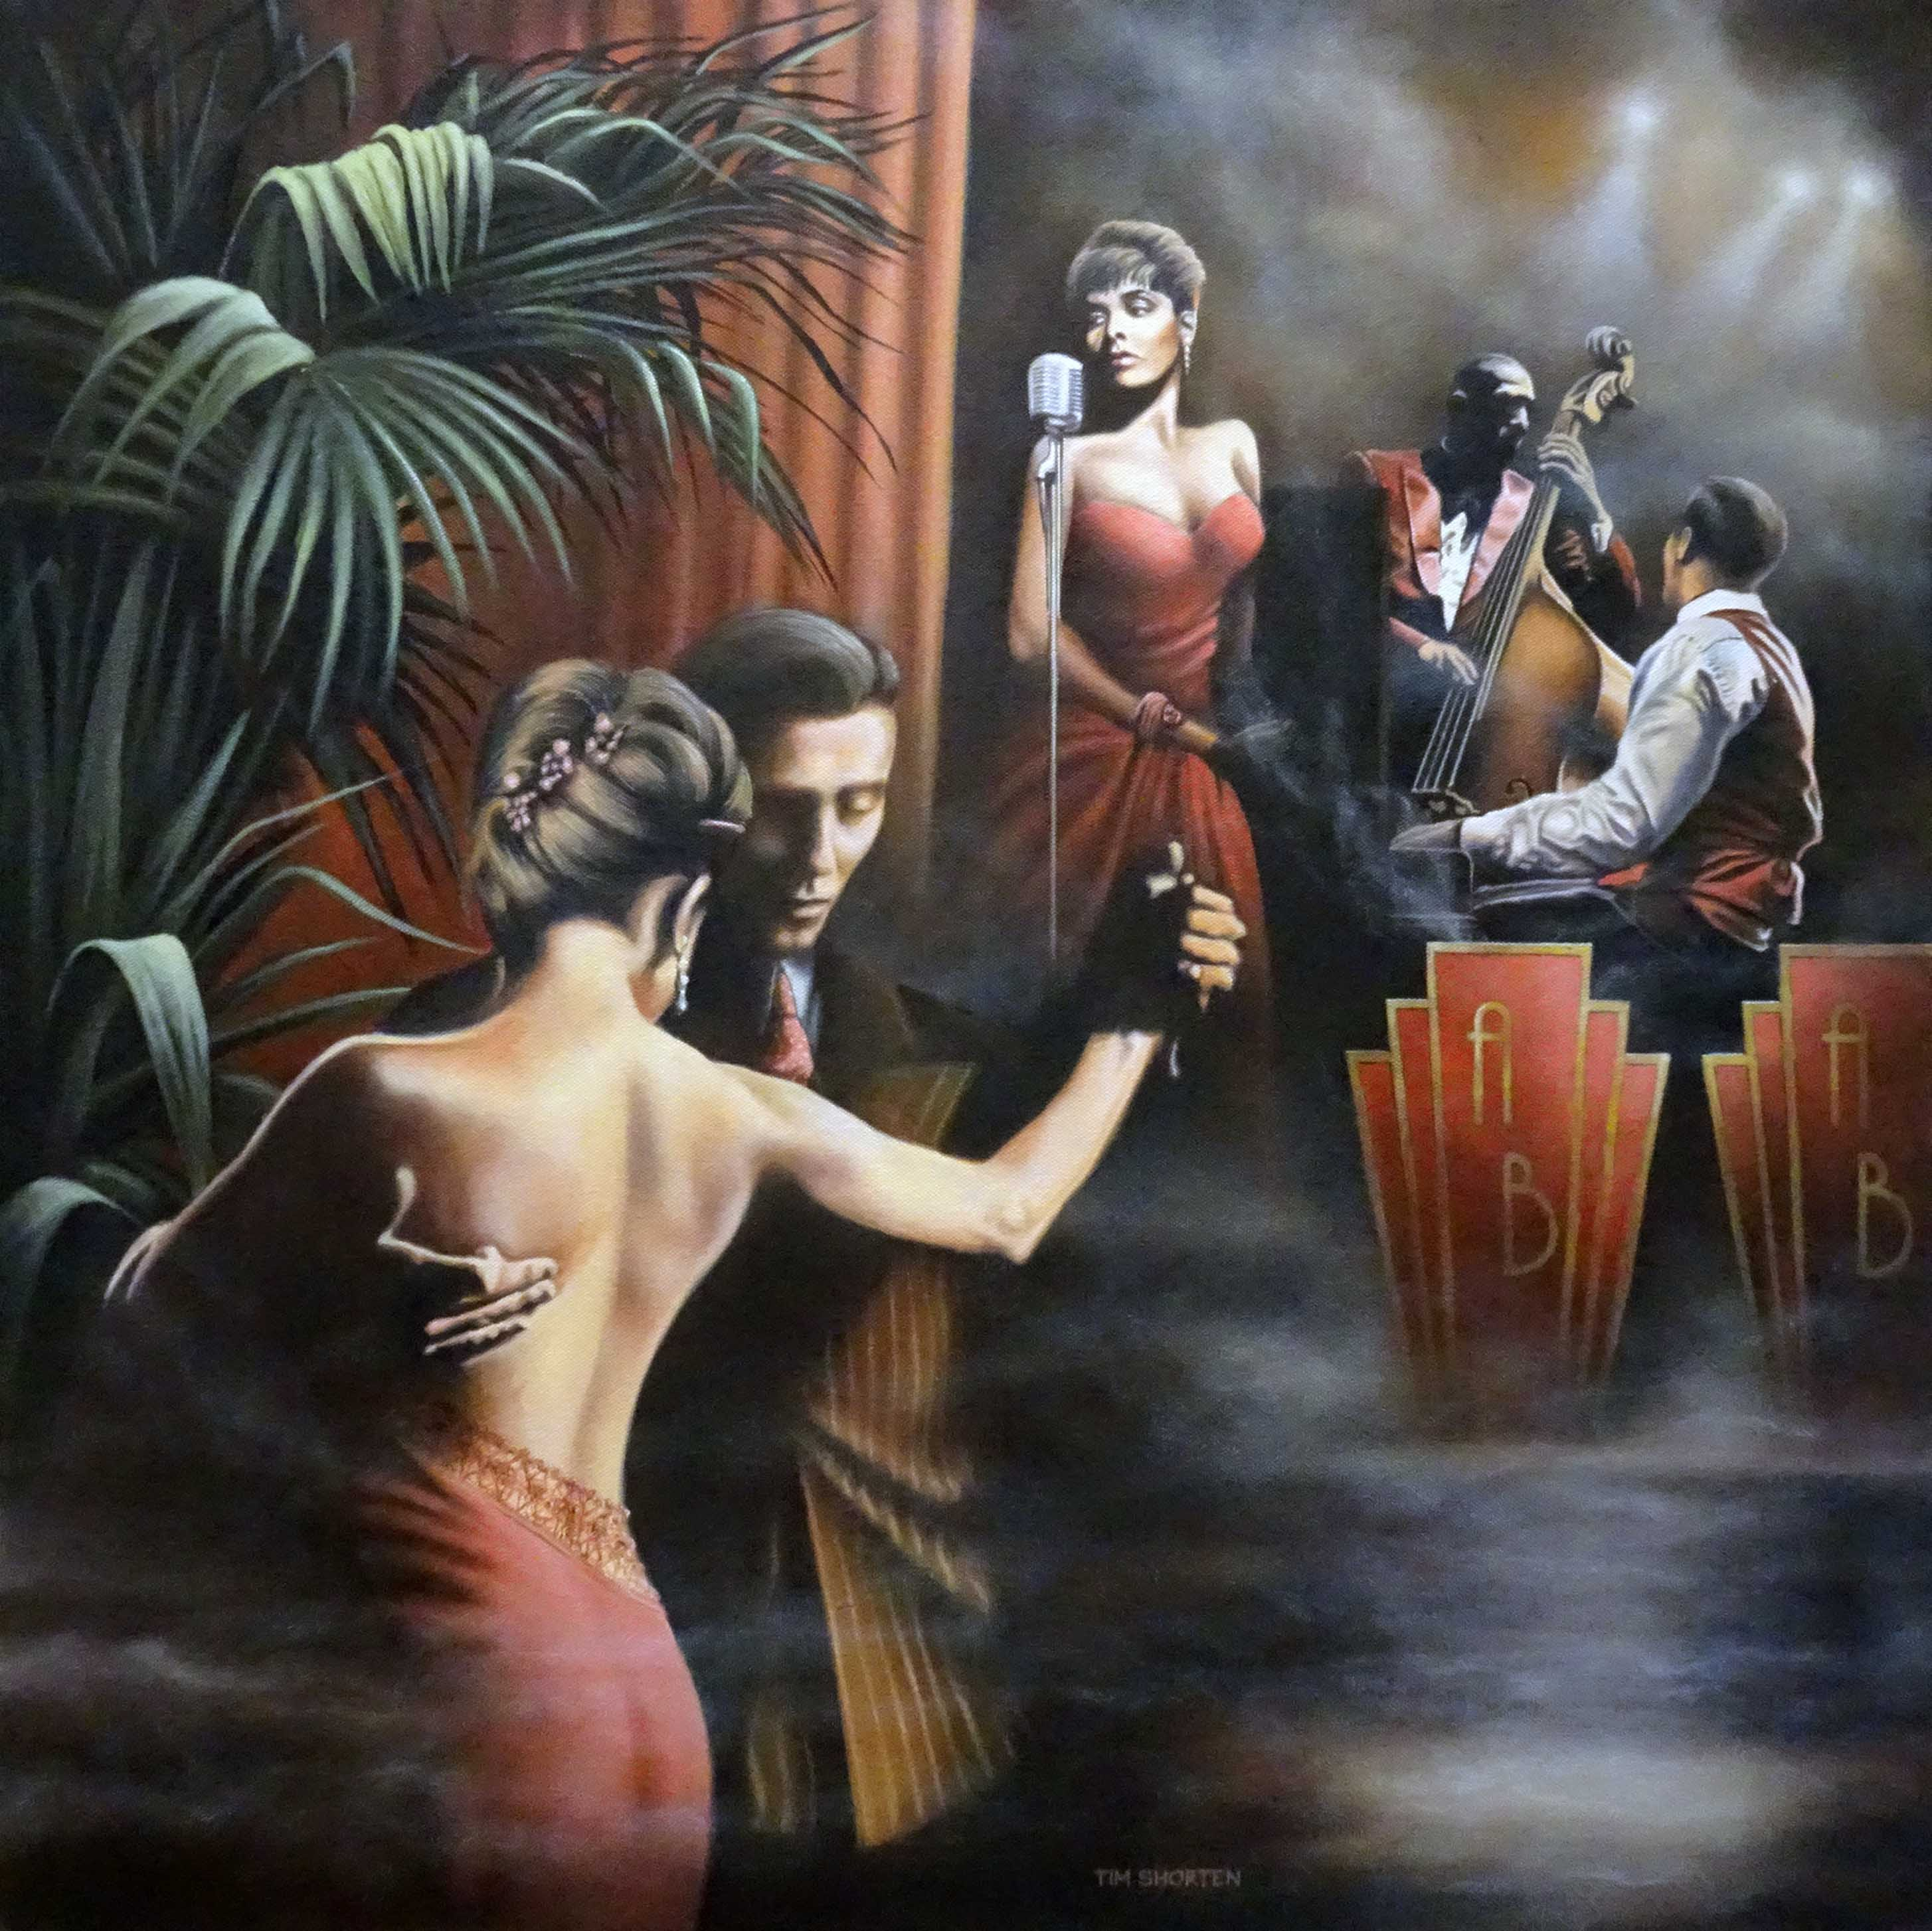 Tim Shorten Last Tango